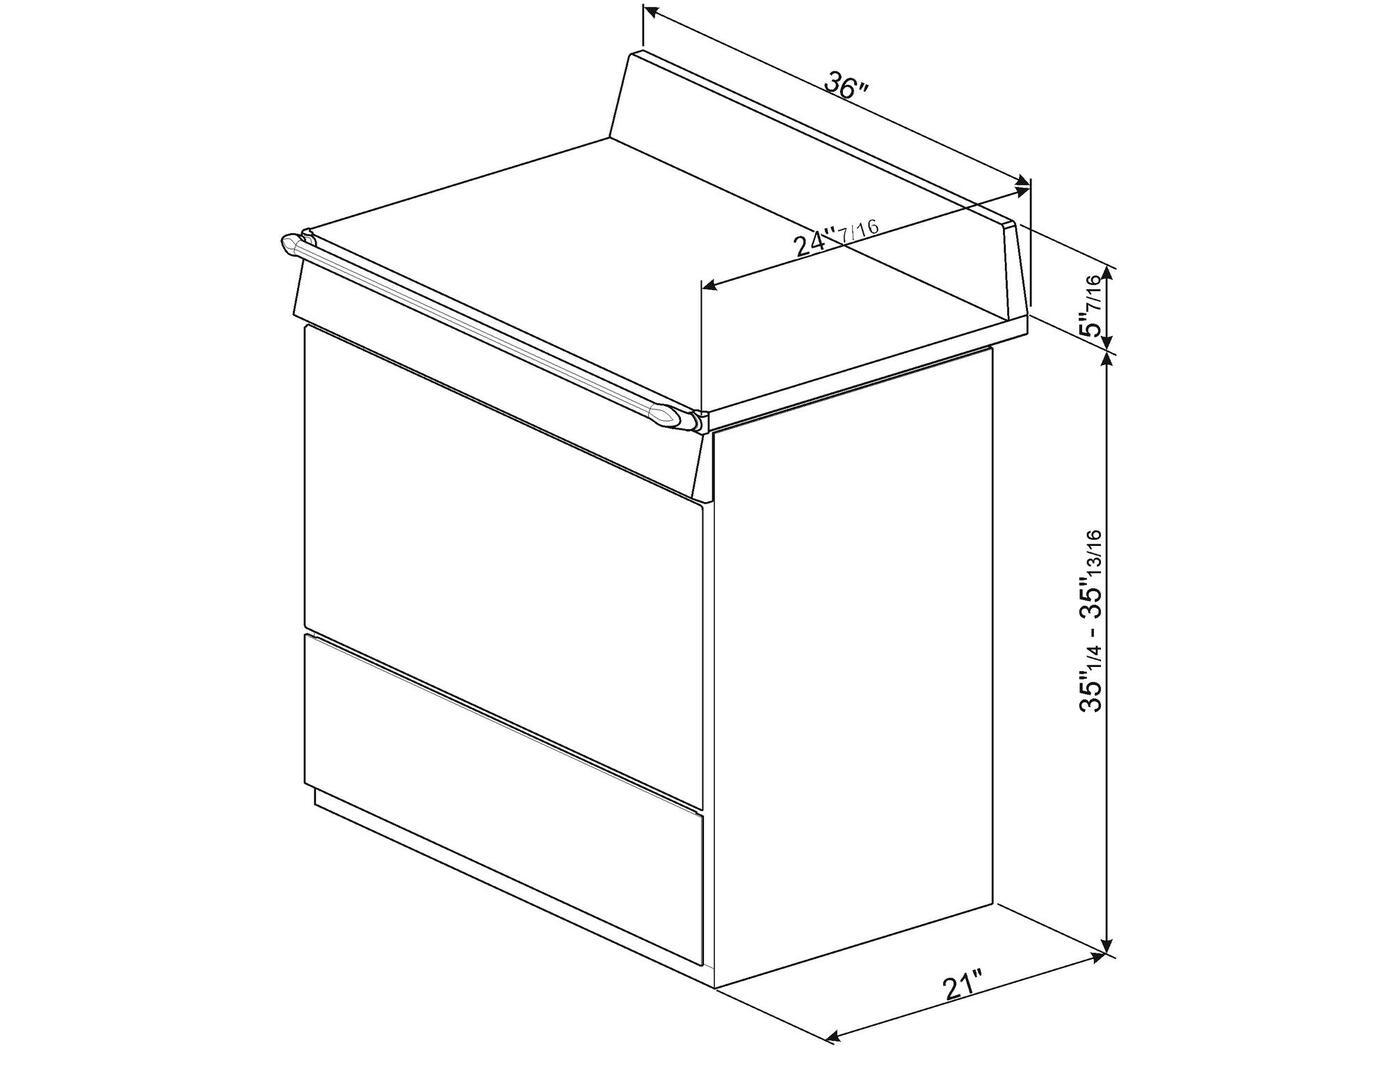 Smeg Tru36ggbl 36 Inch Victoria Series Glossy Black Gas Freestanding Wiring Diagram Oven Dimenions Guide